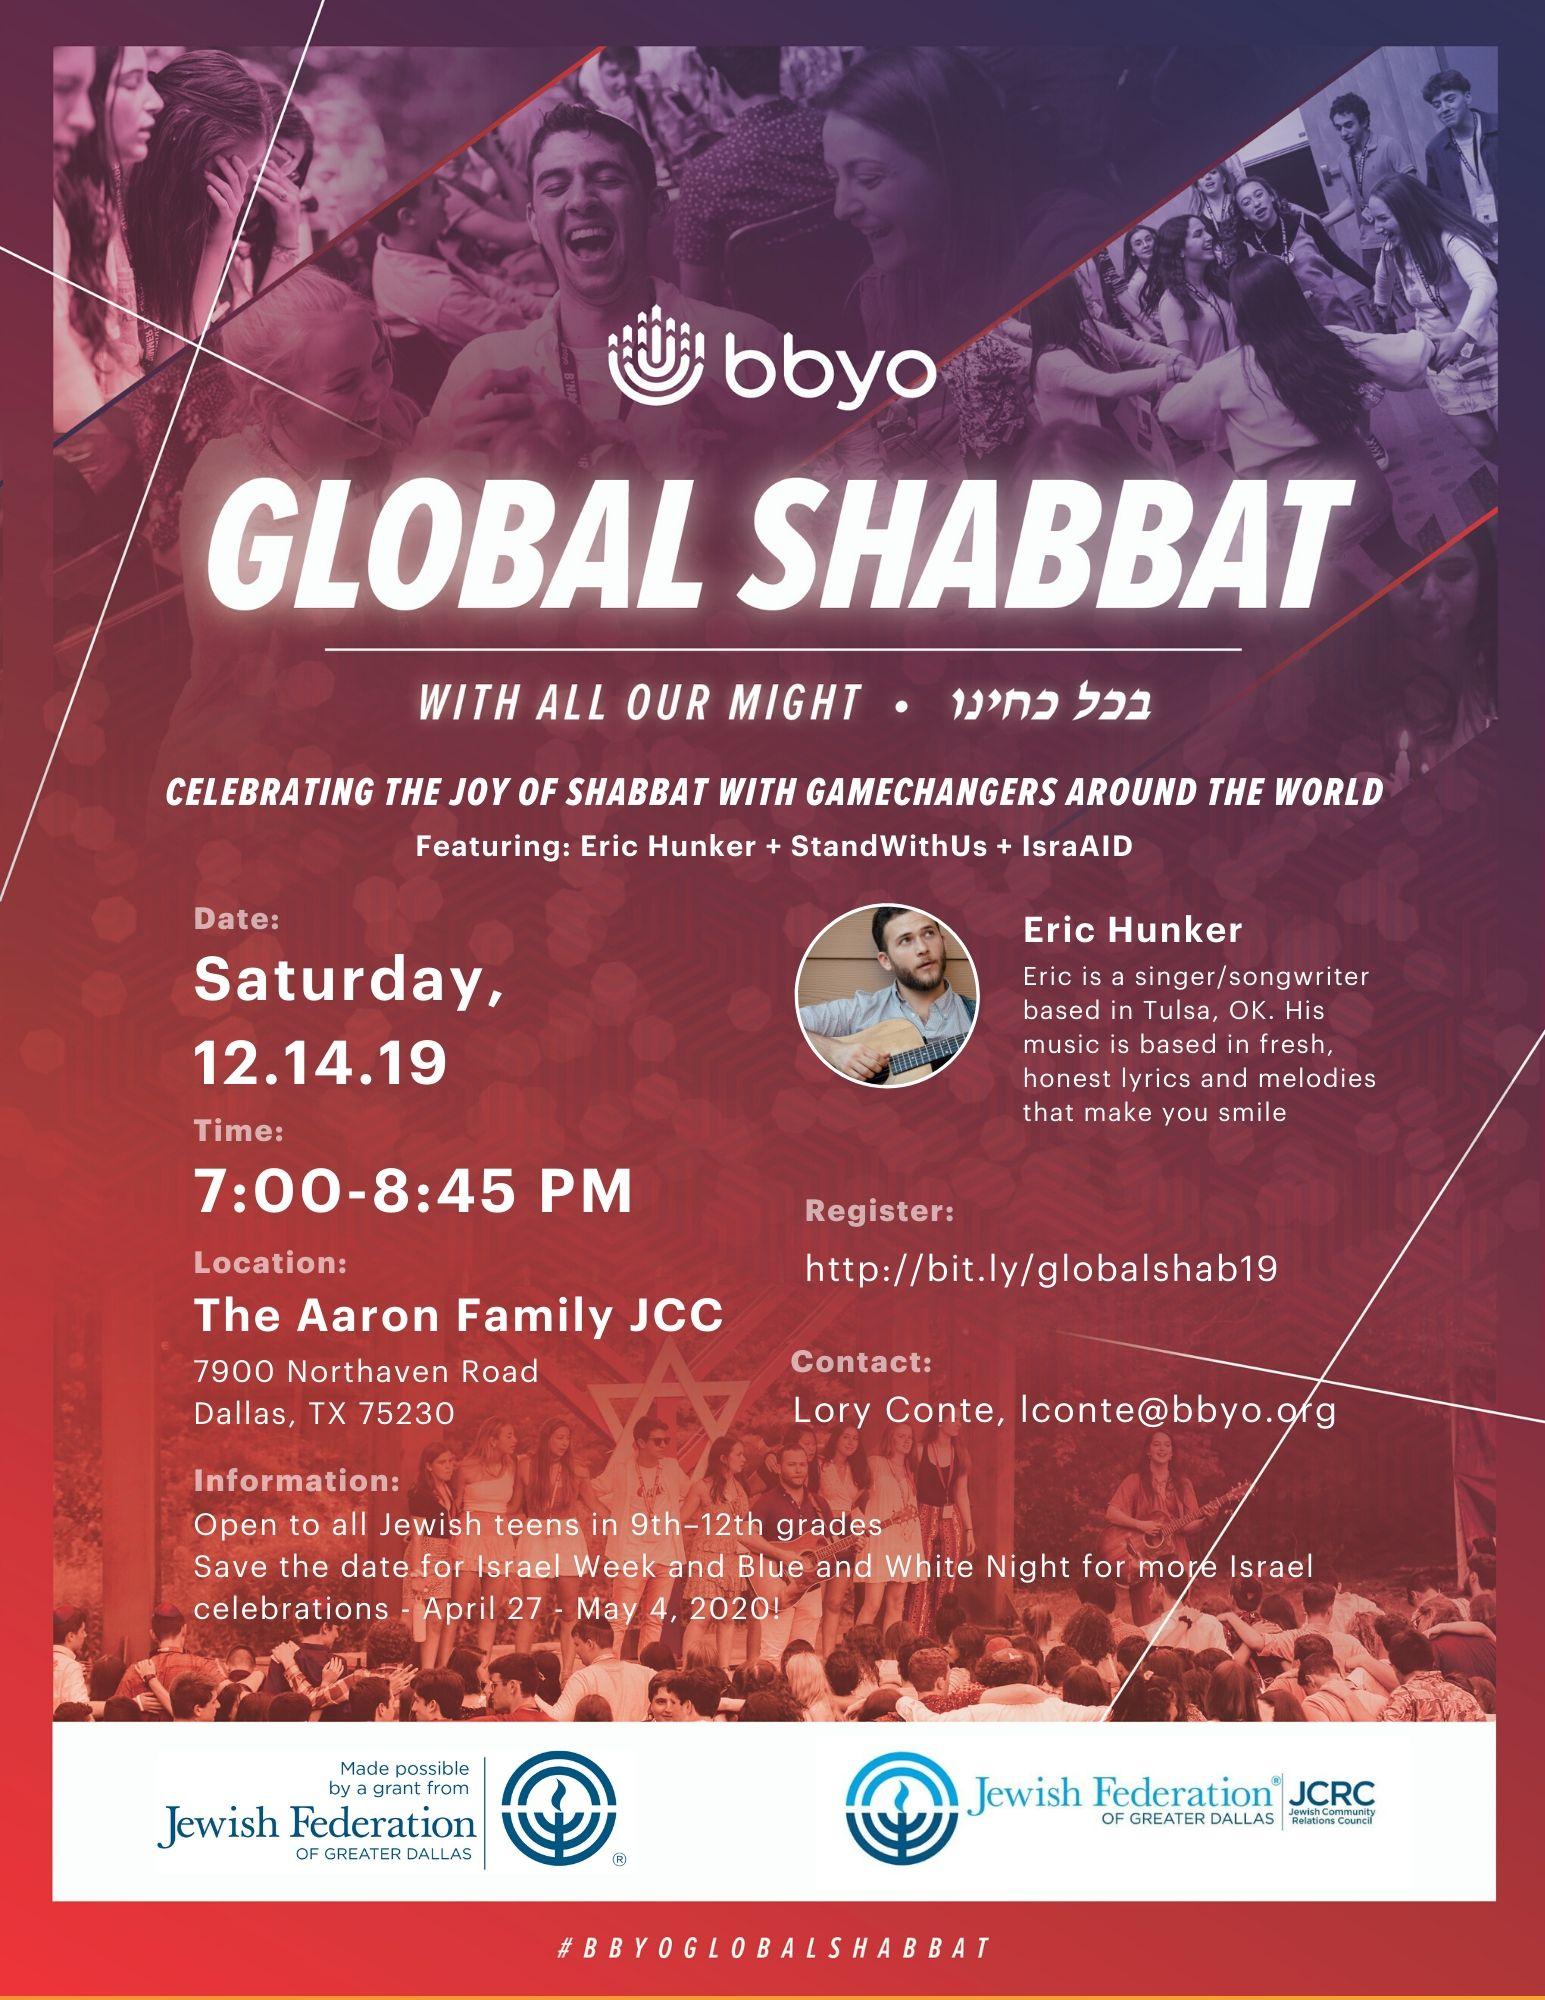 Global Shabbat image